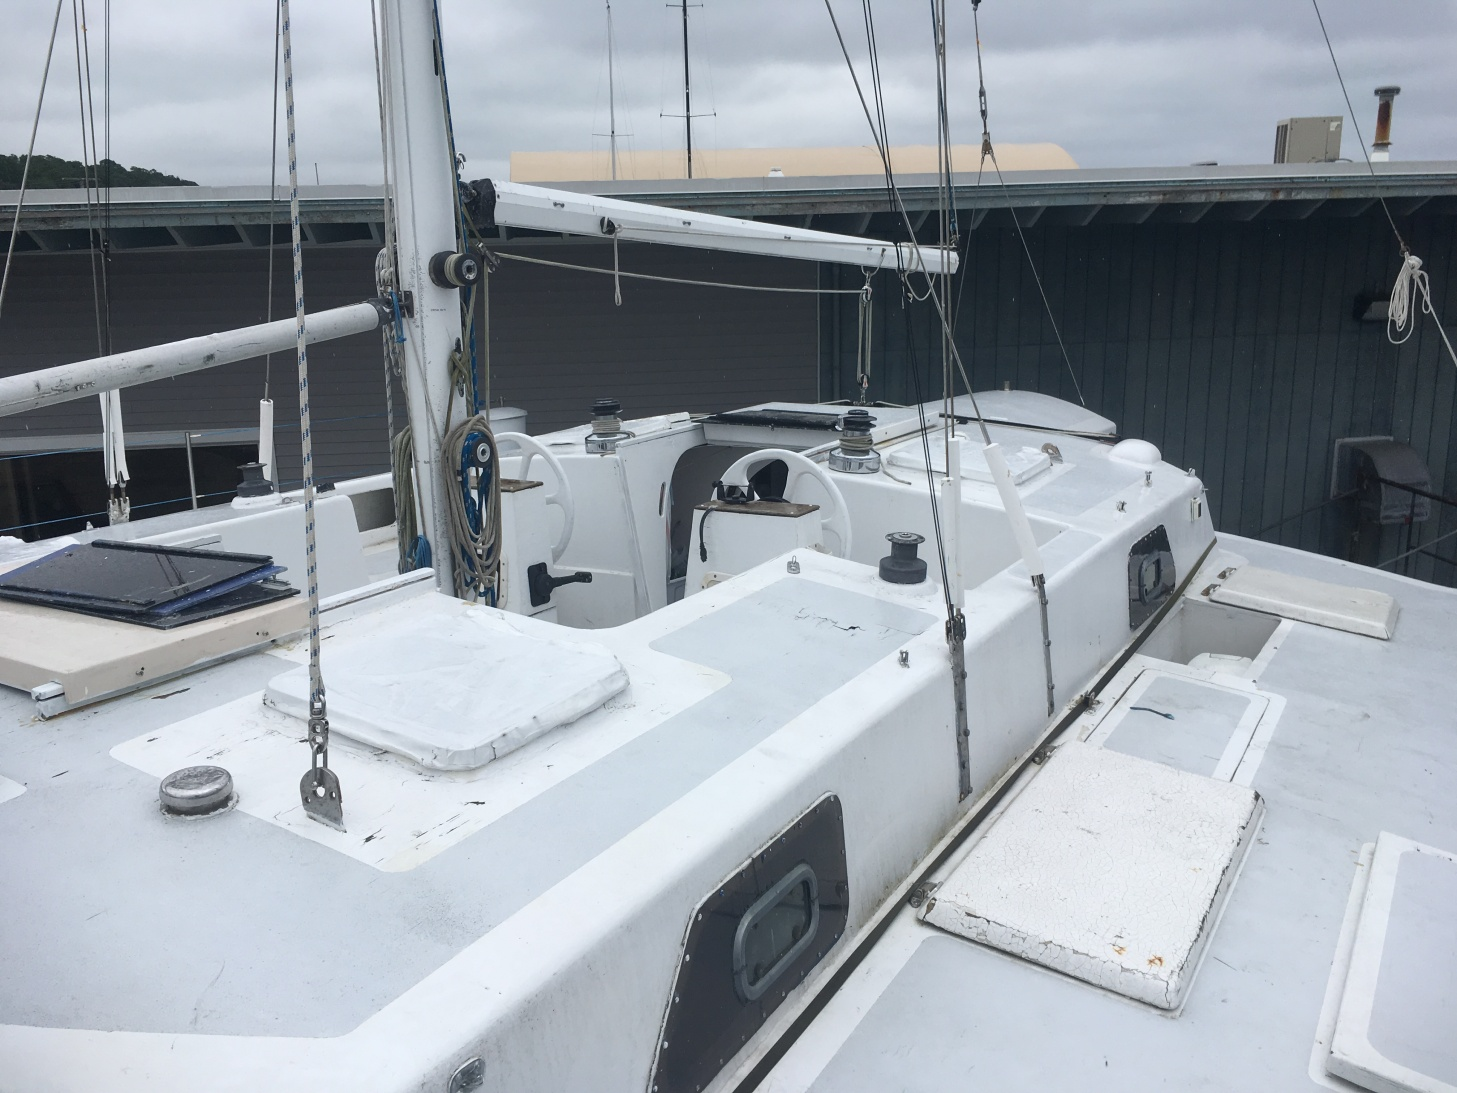 For Sale: 1987 Searunner 37 Trimaran - Cruisers & Sailing Forums